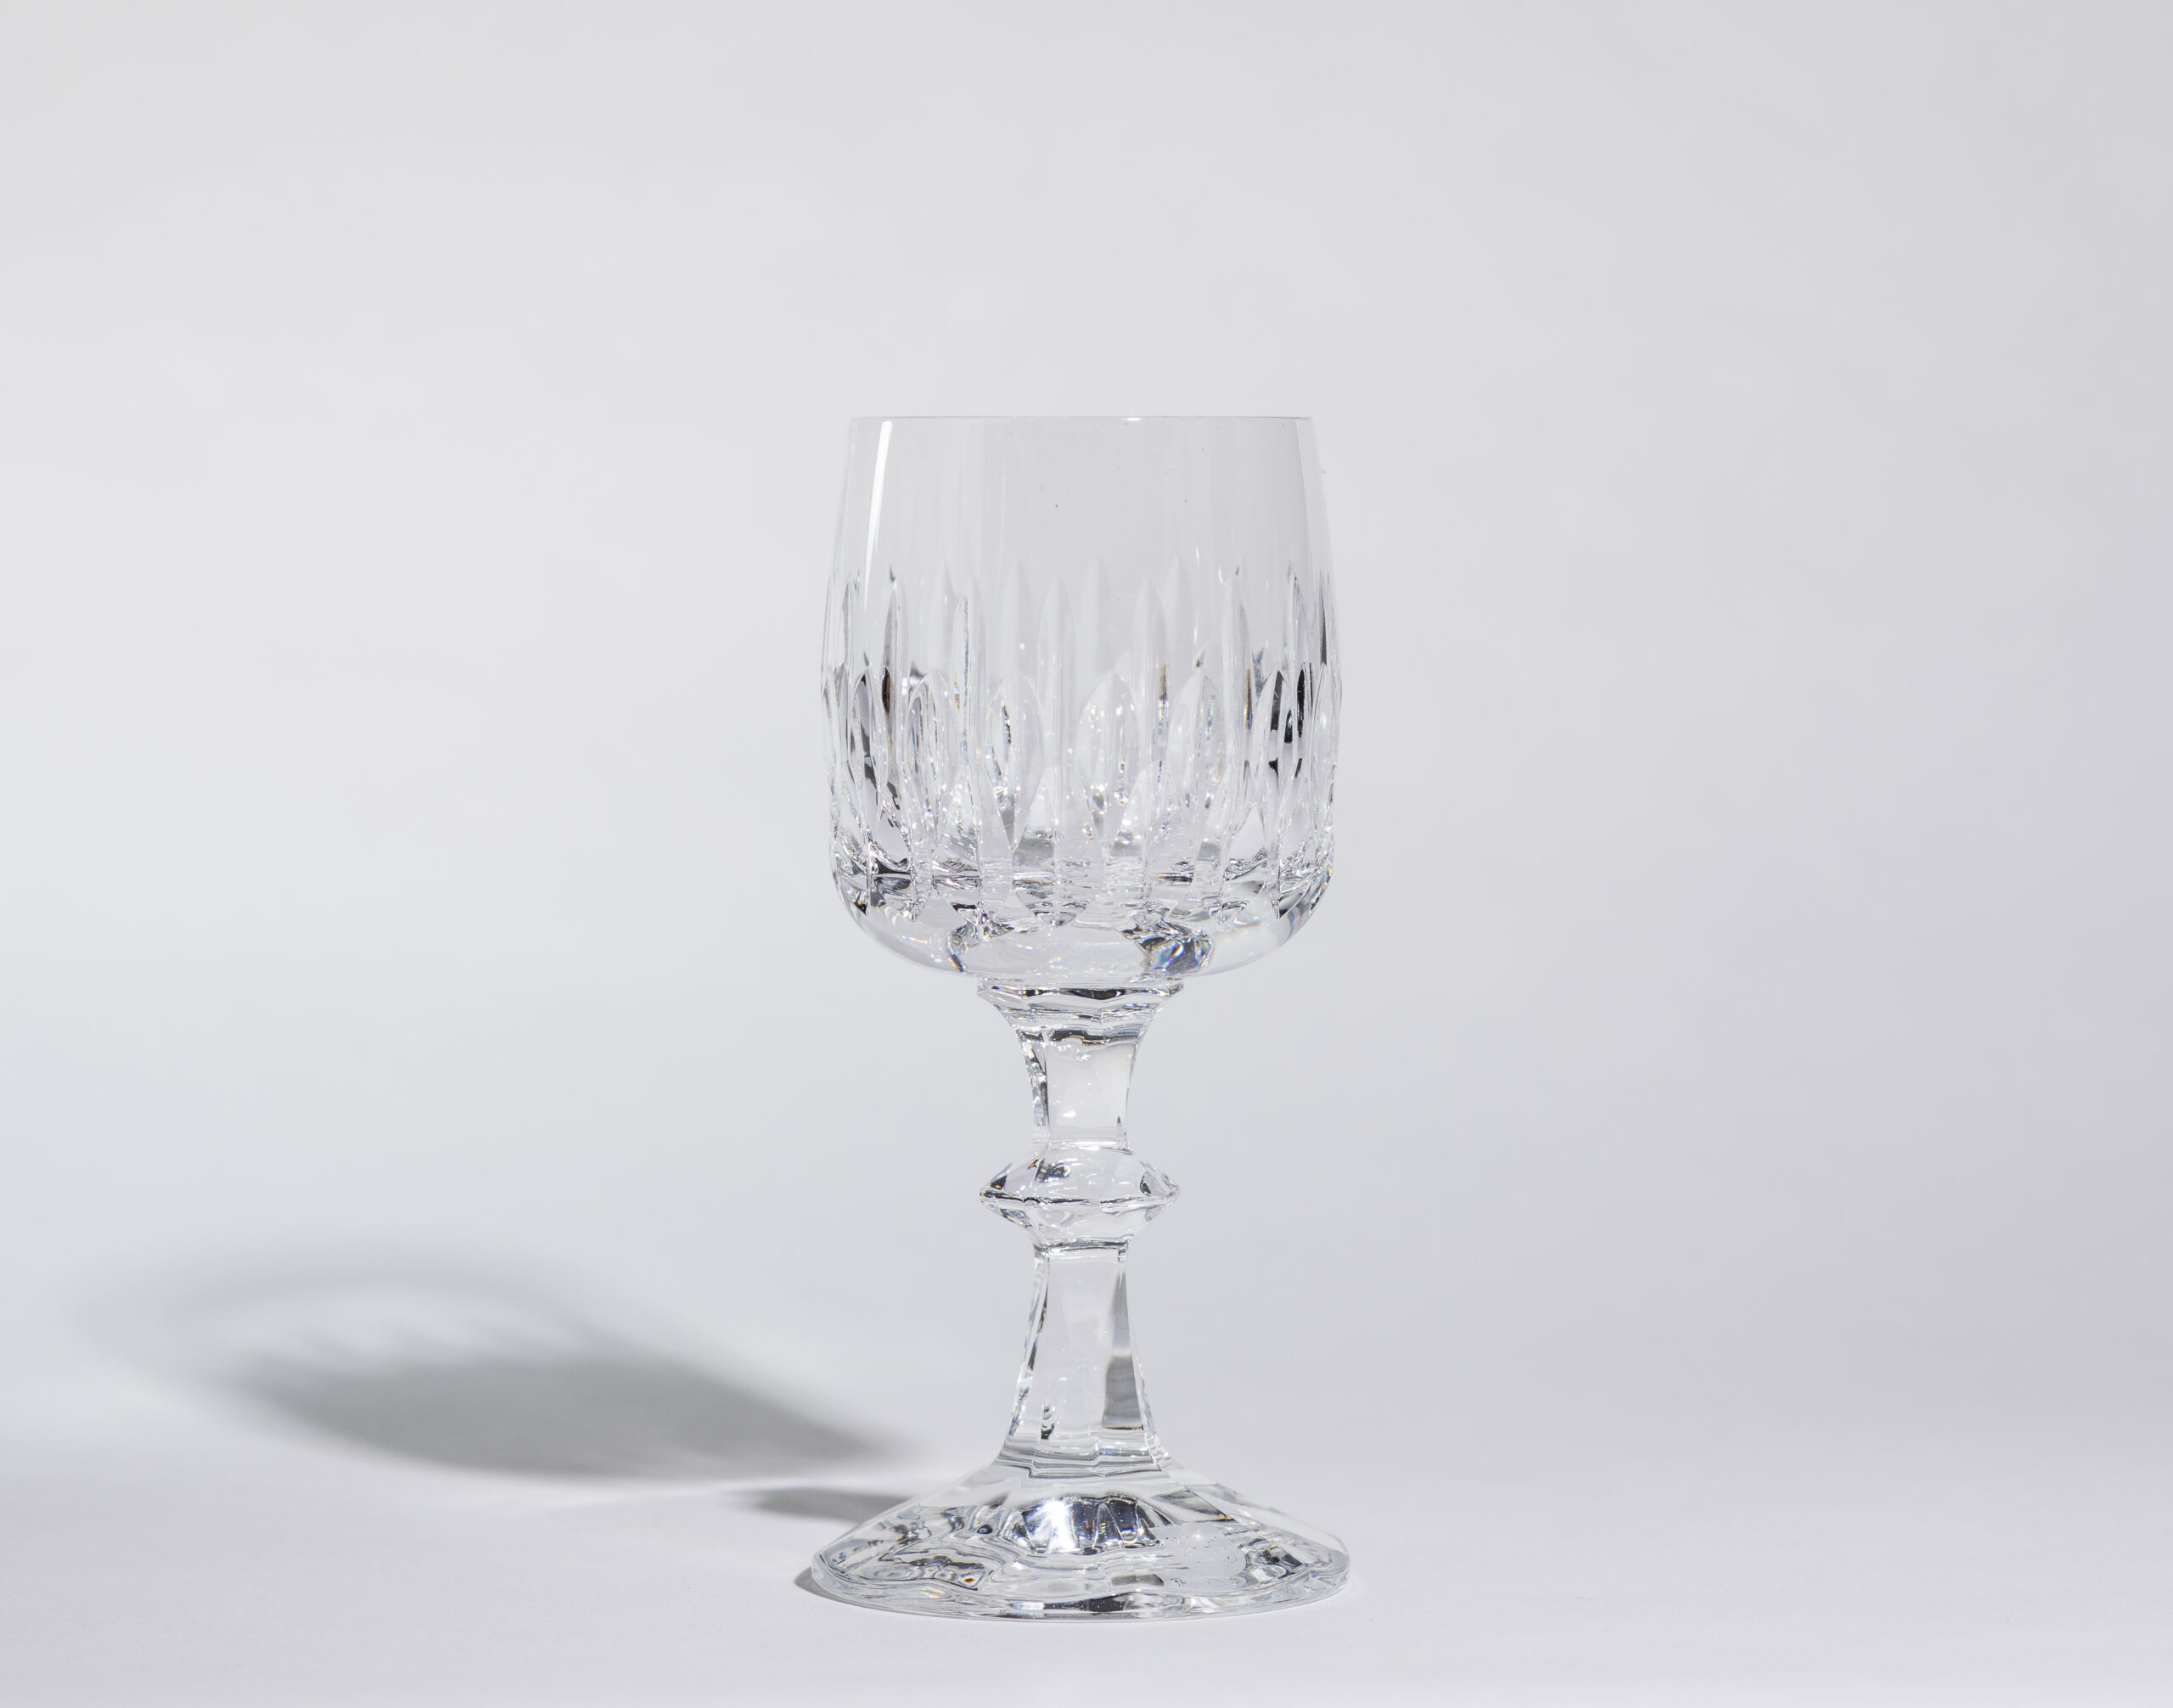 Wine glasses (6oz, stemmed)